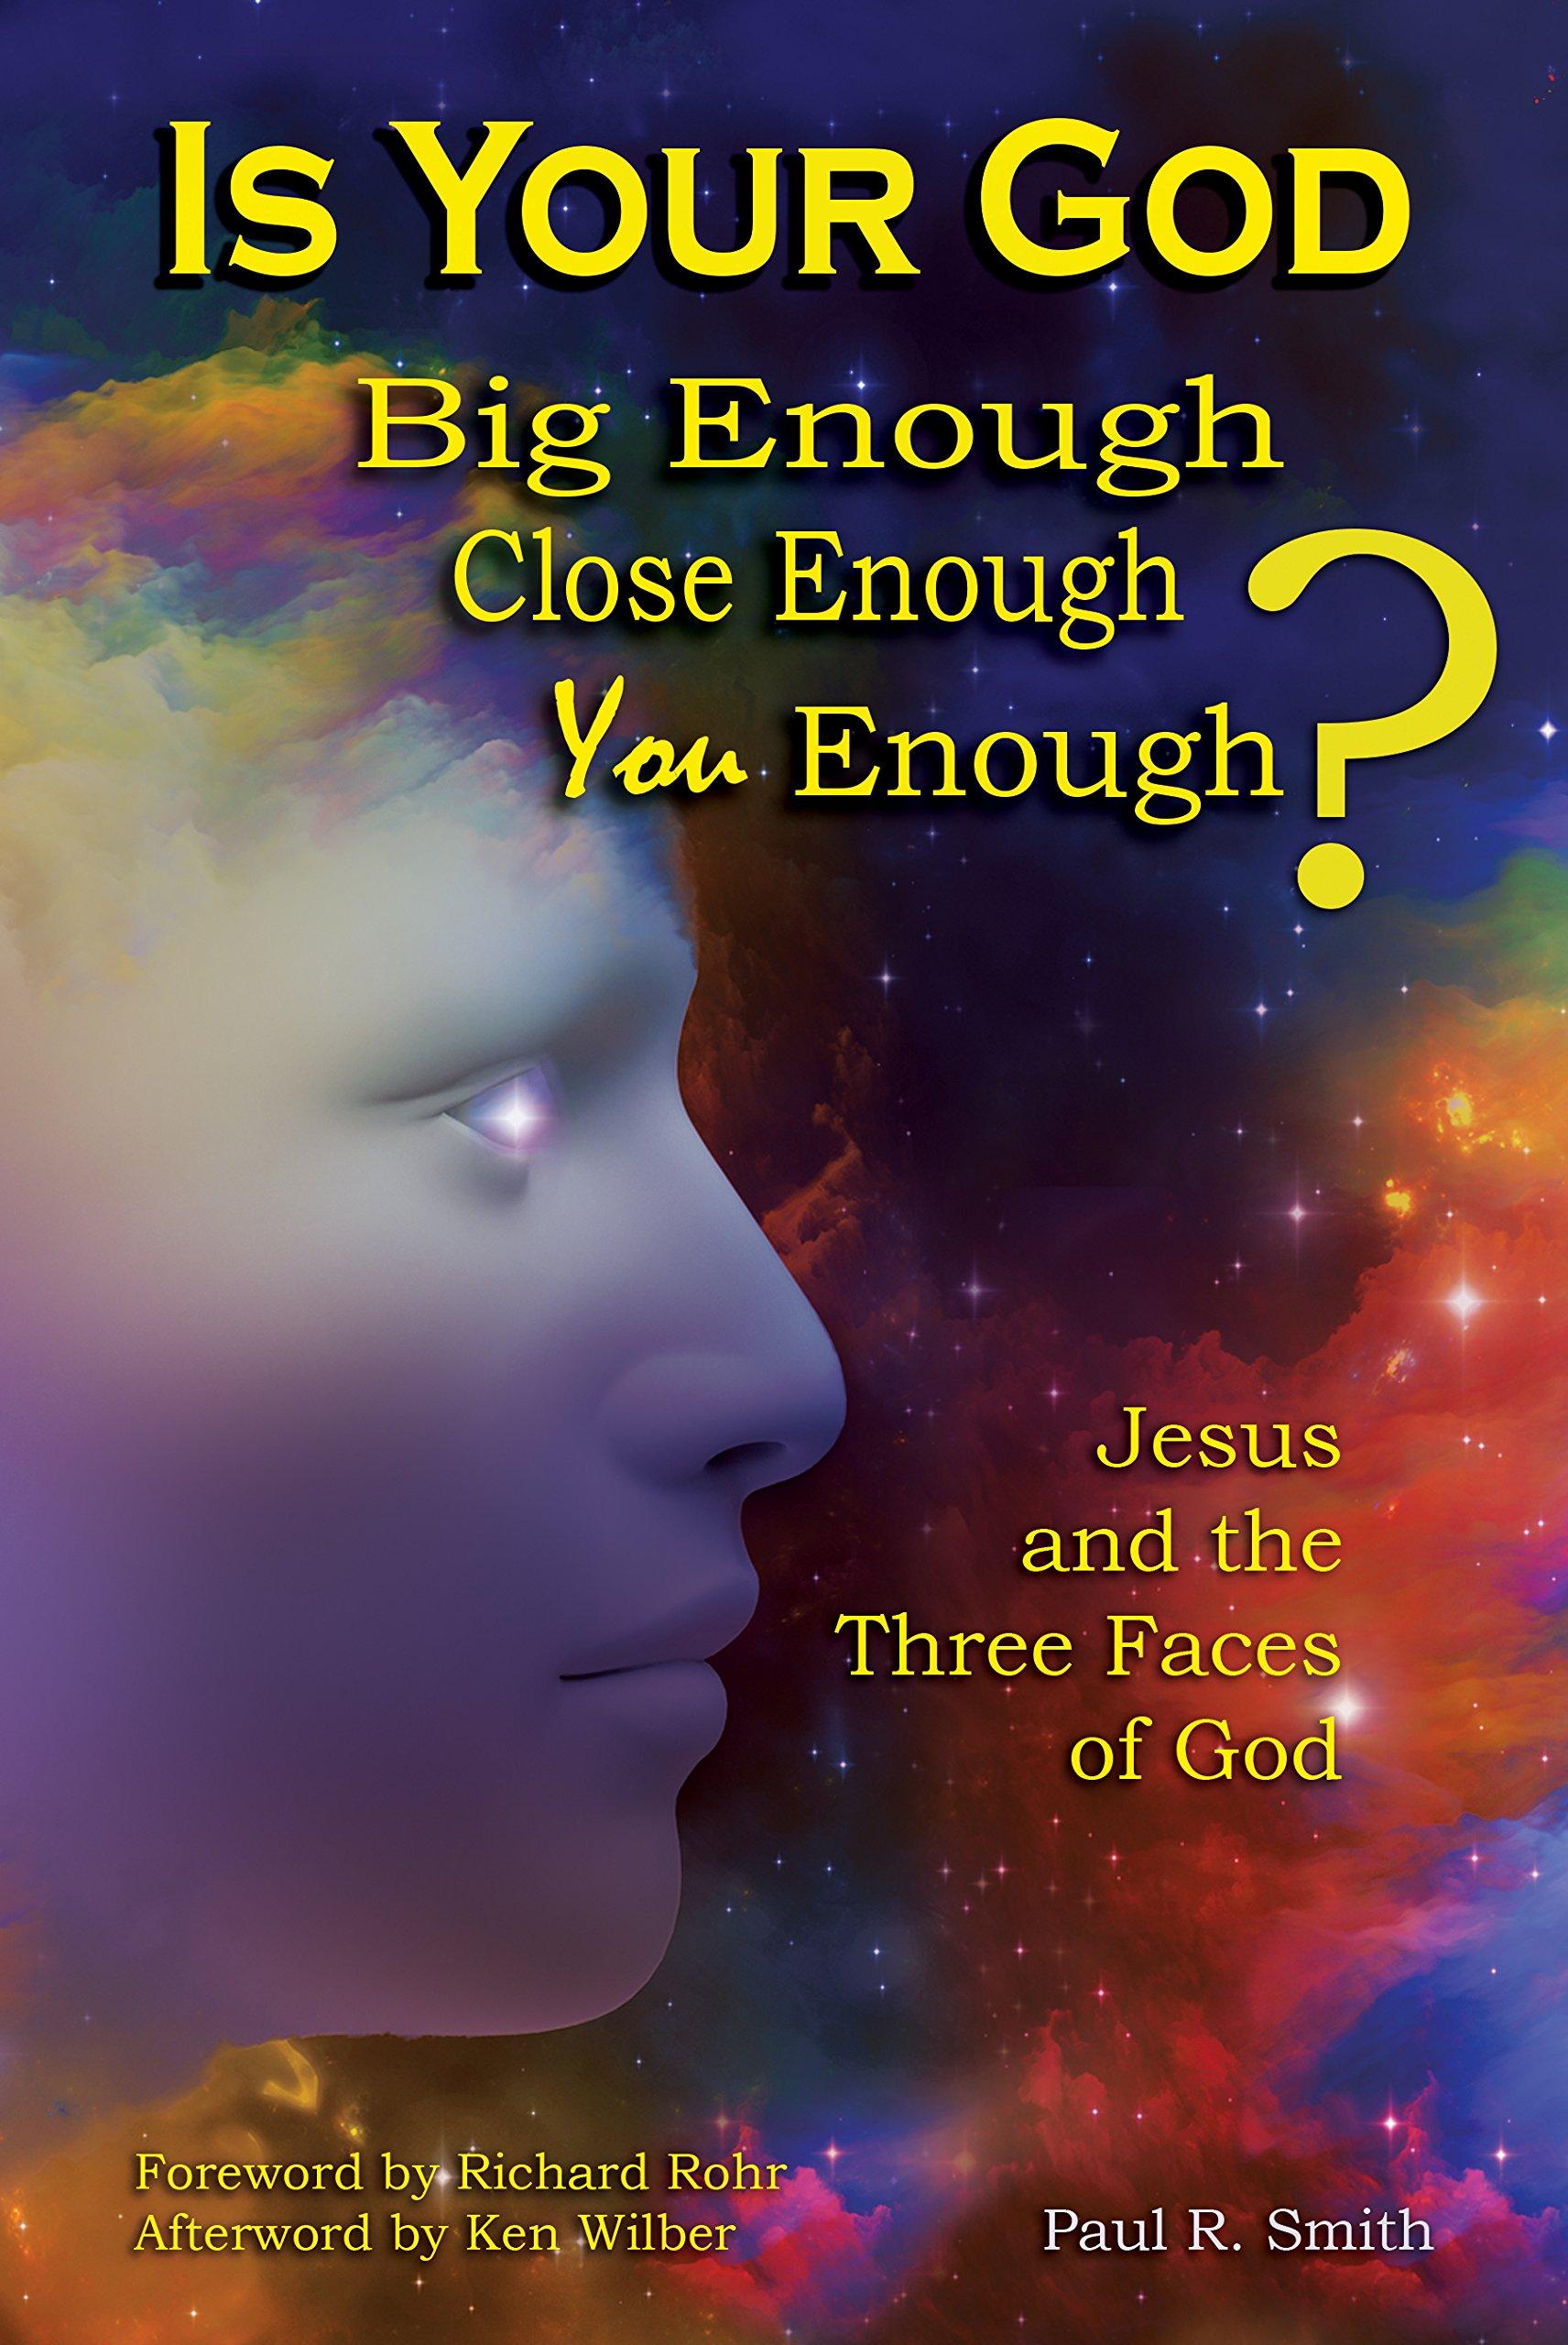 Is Your God Big Enough Close Enough You Enough?